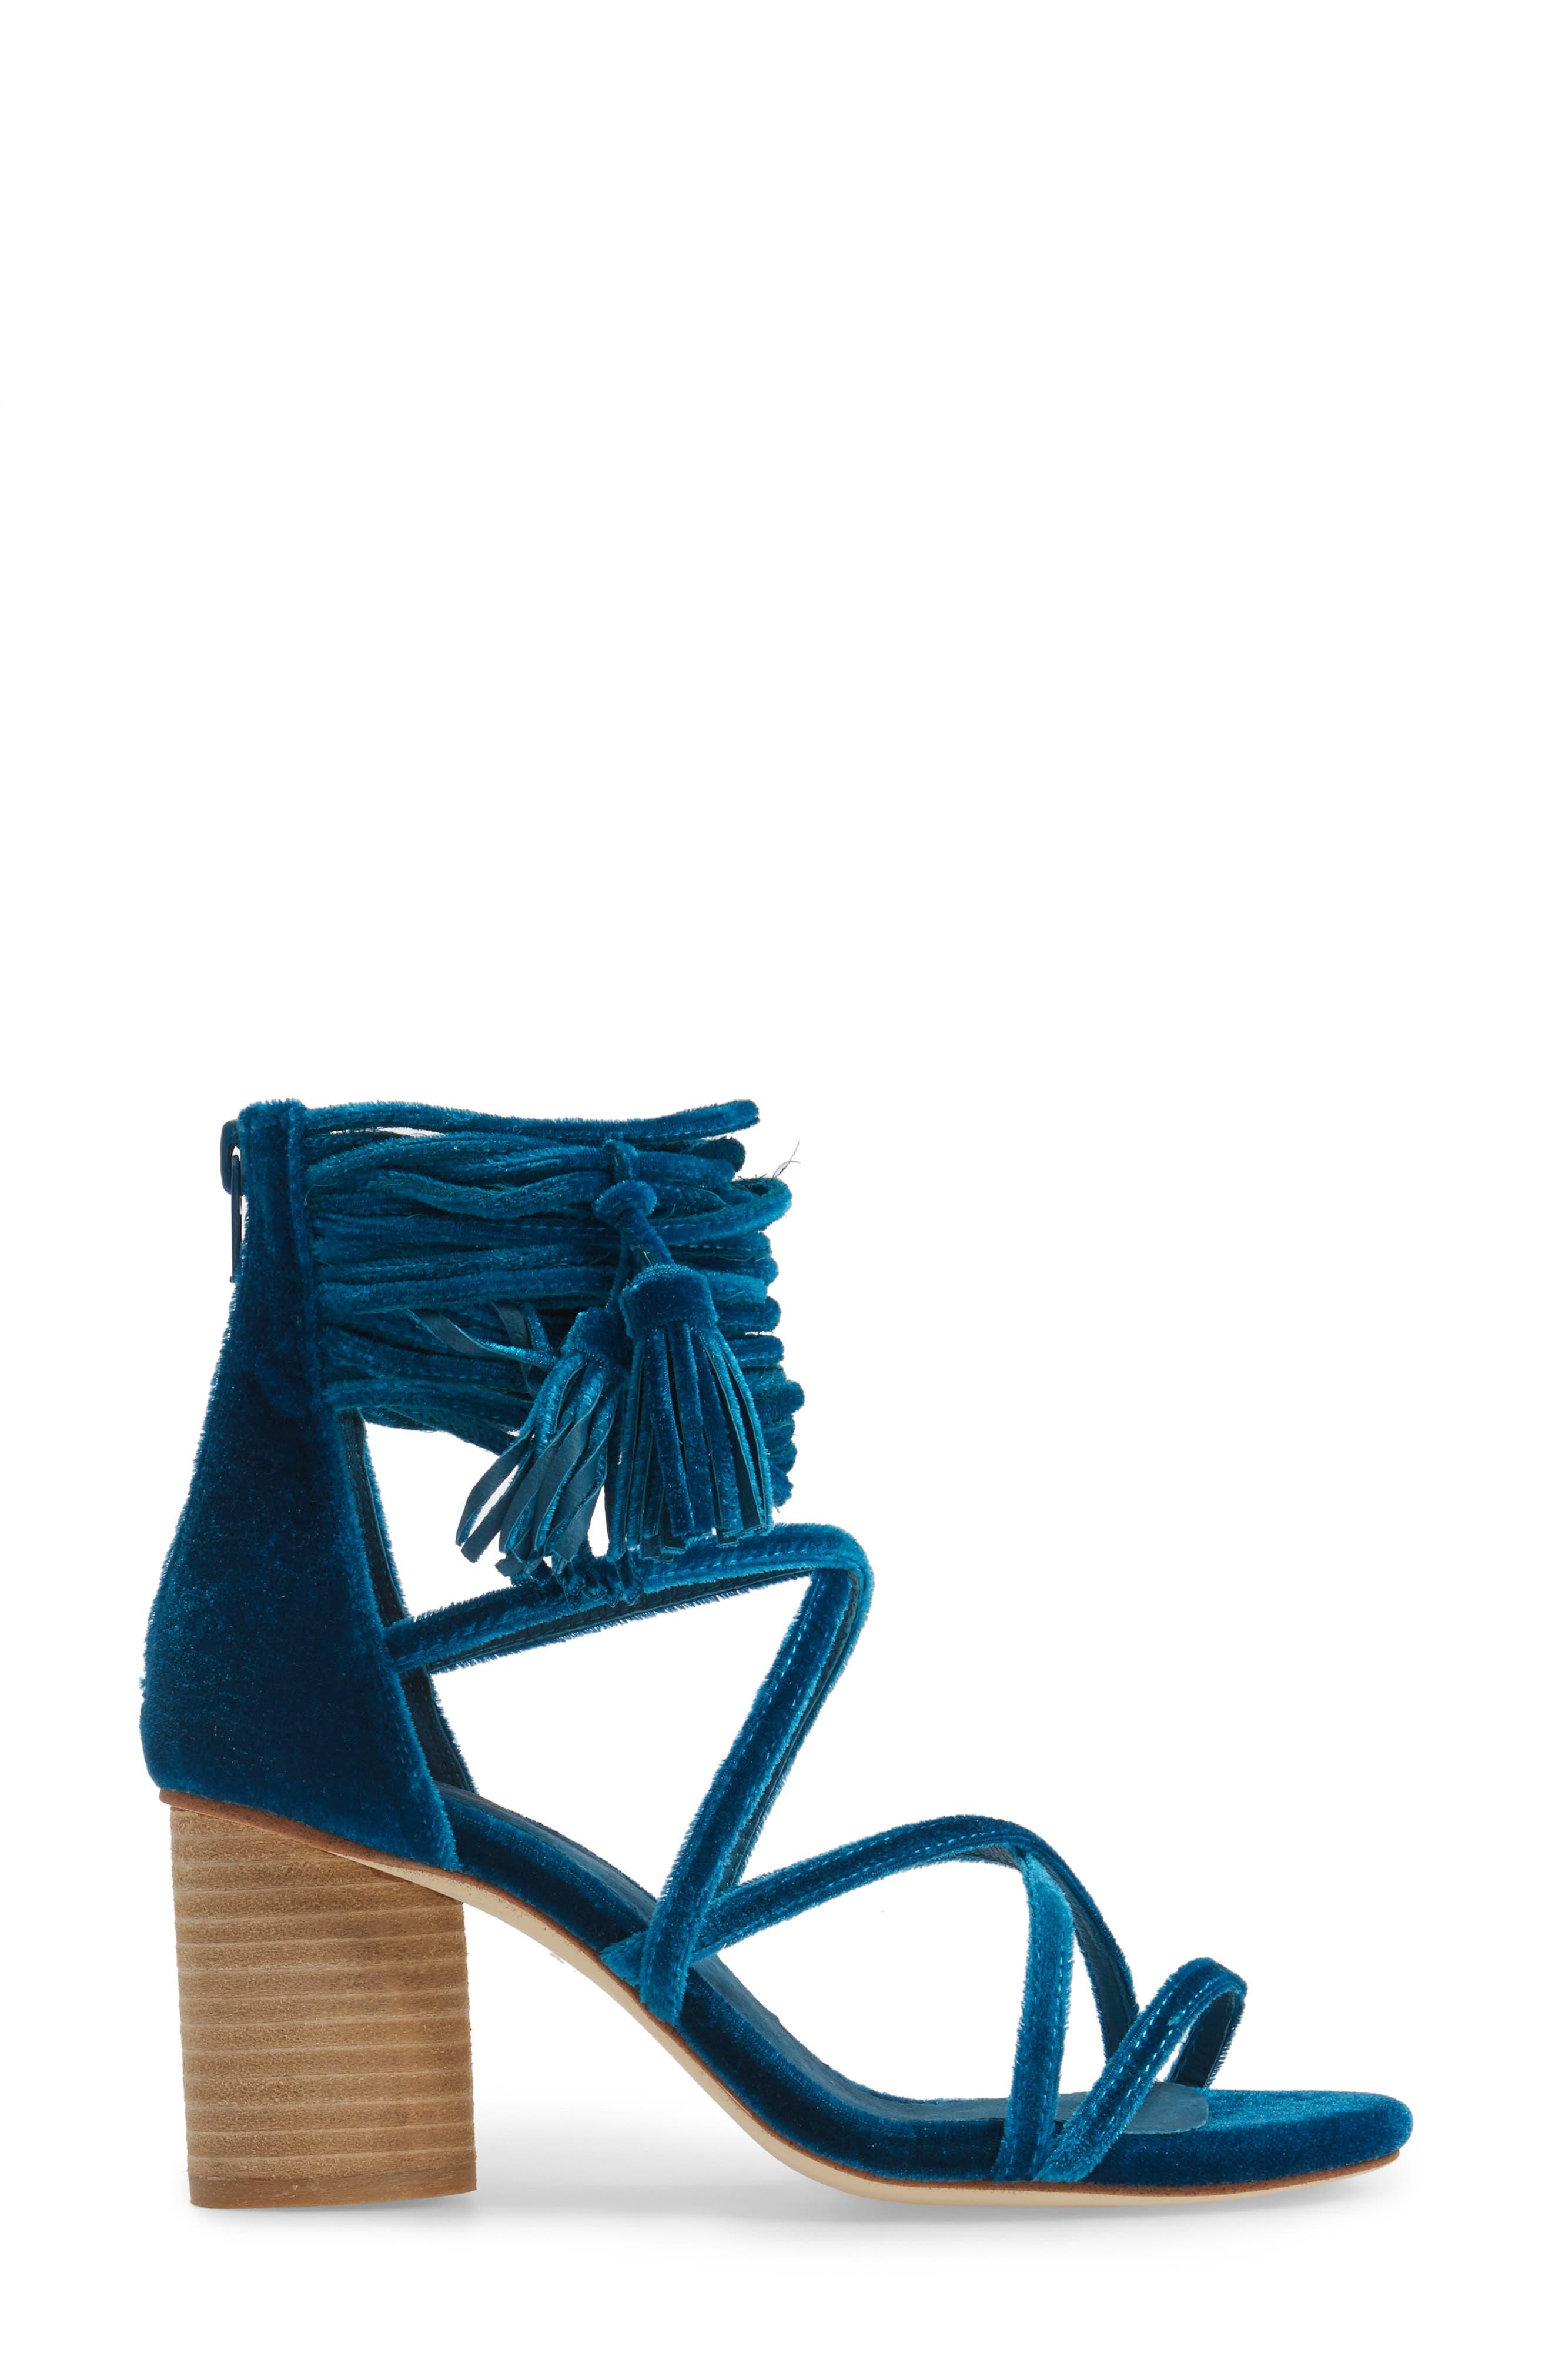 'Despina' Strappy Sandal,                             Alternate thumbnail 19, color,